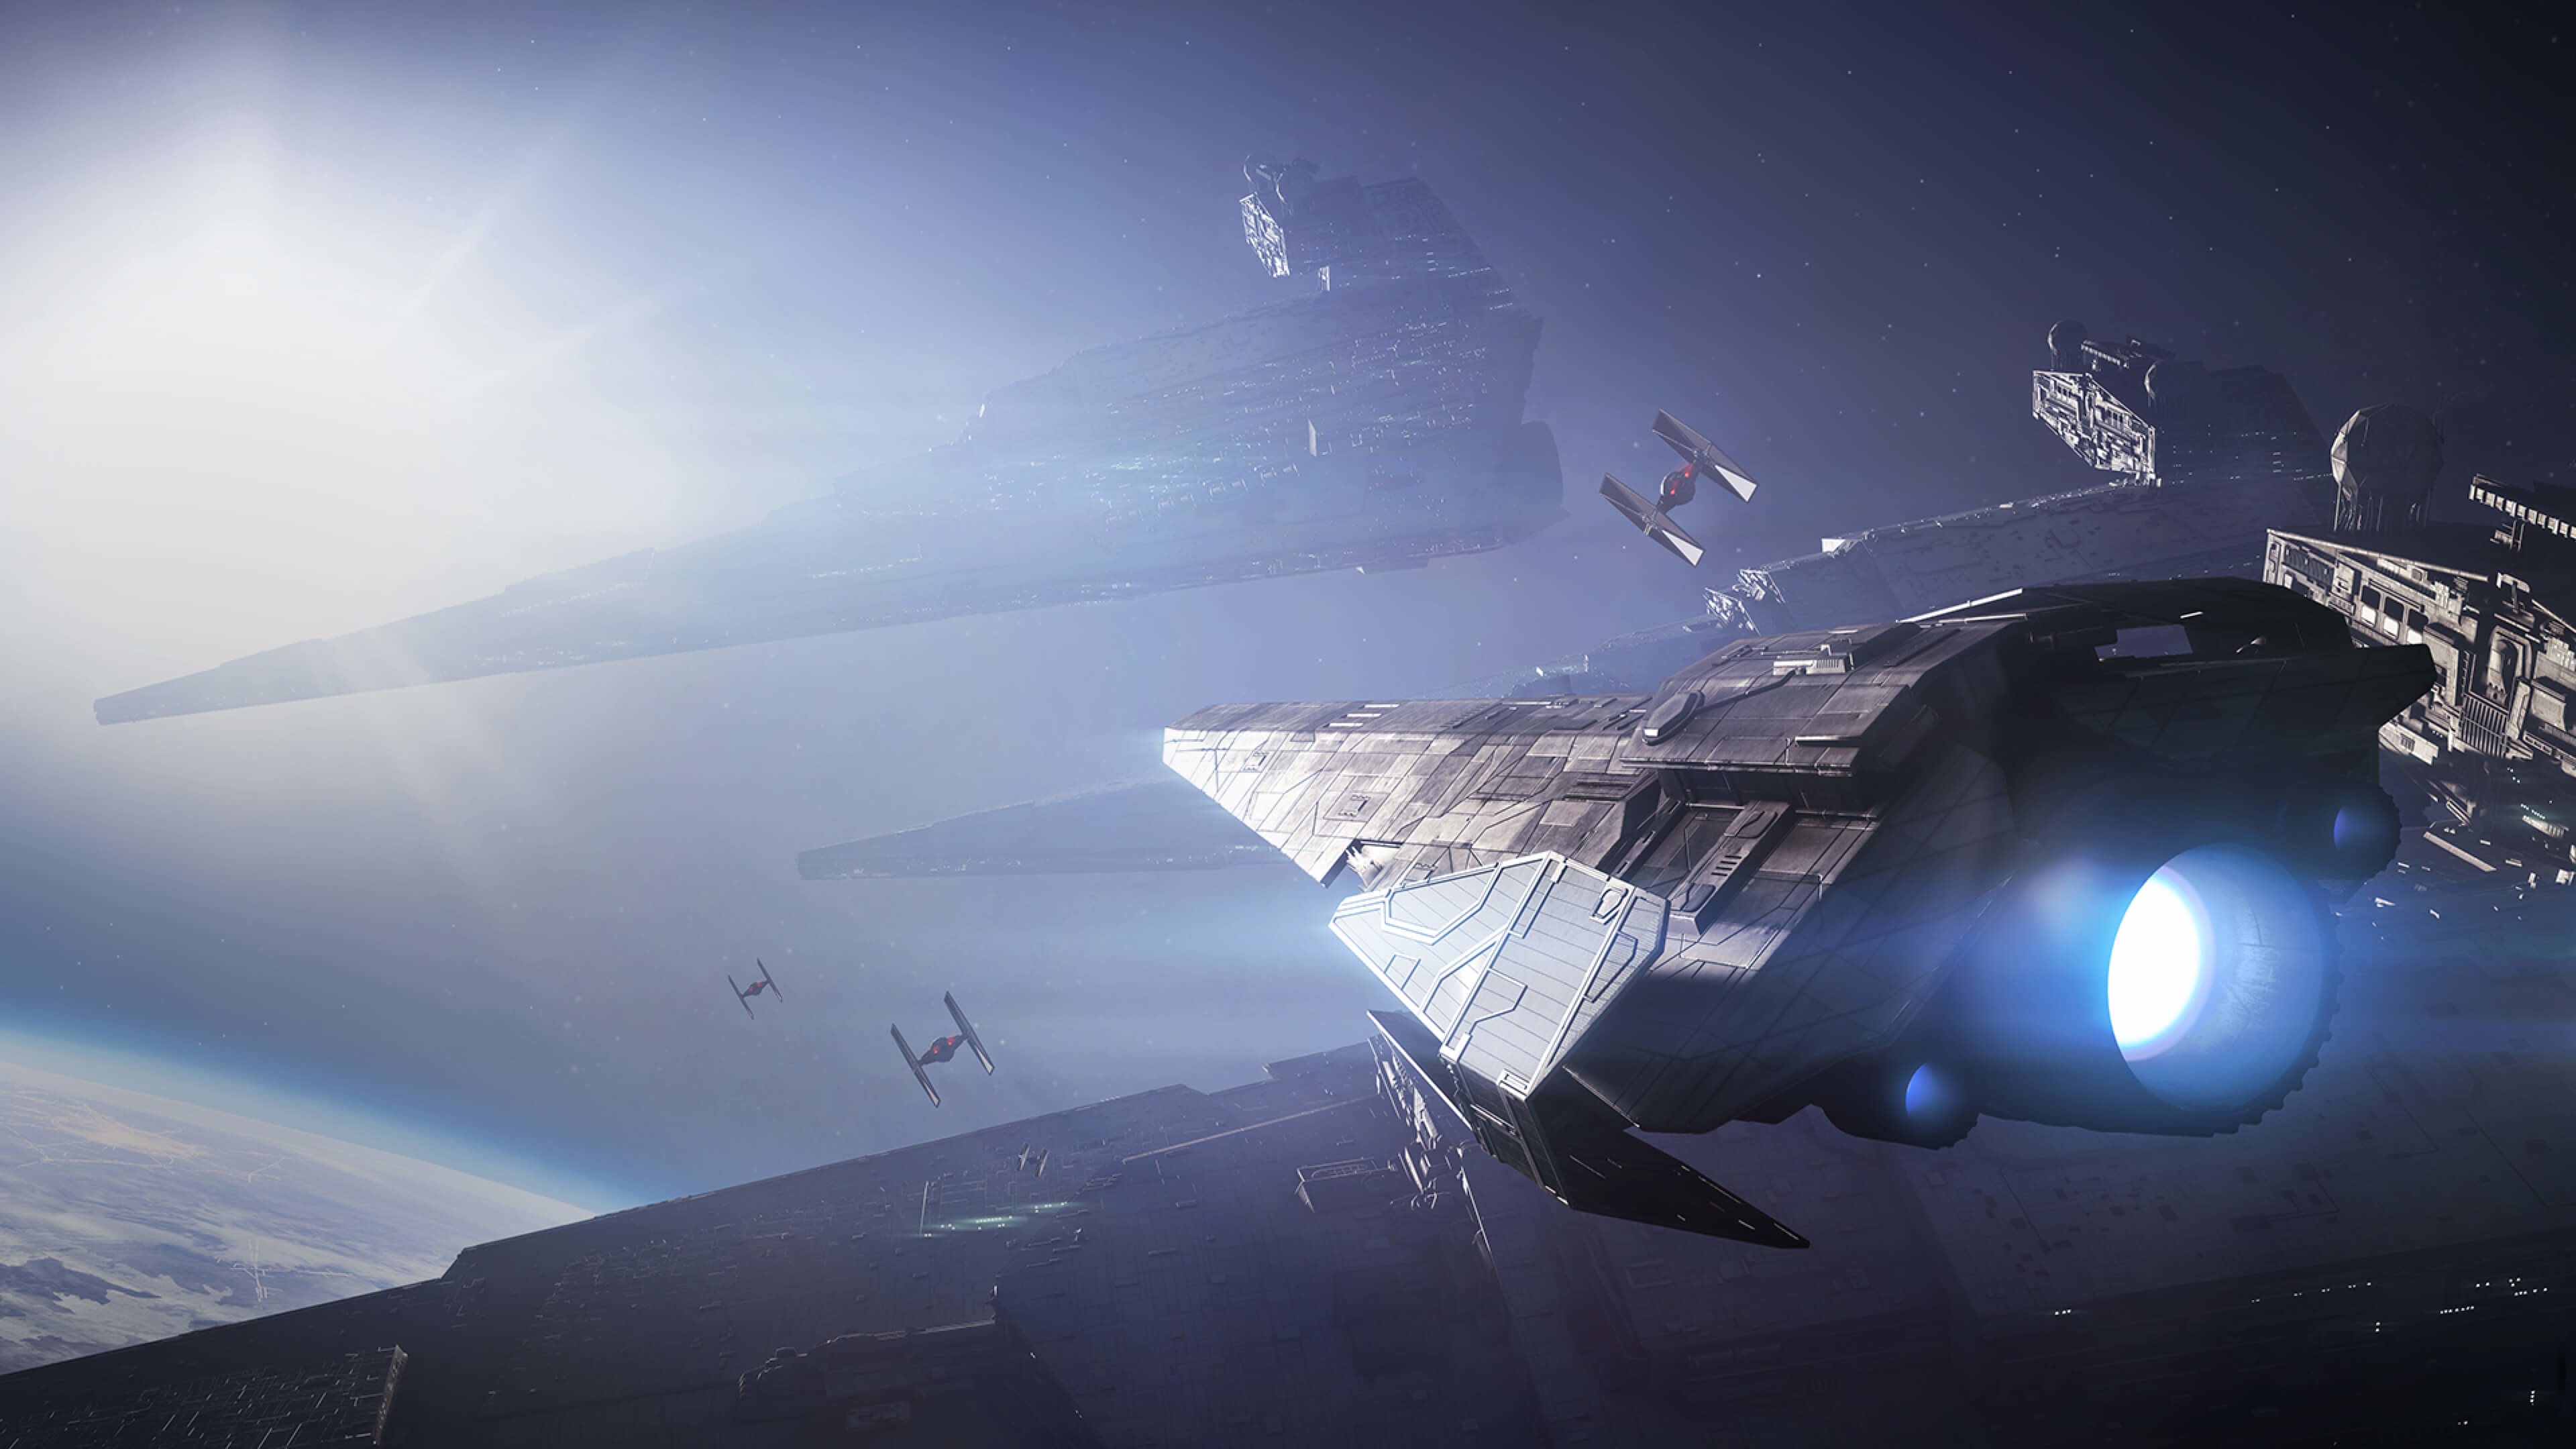 … Last Jedi Wallpaper 'Rey and Kylo'